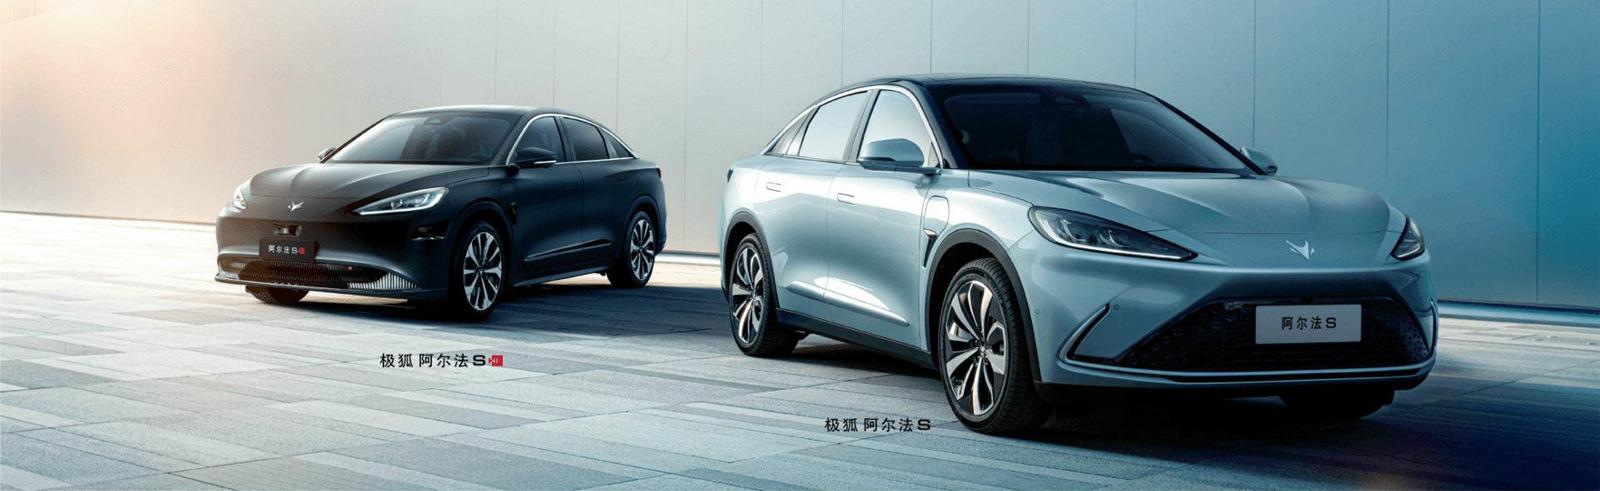 Huawei and BAIC unveil the ArcFox αS HI at the Auto Shanghai 2021